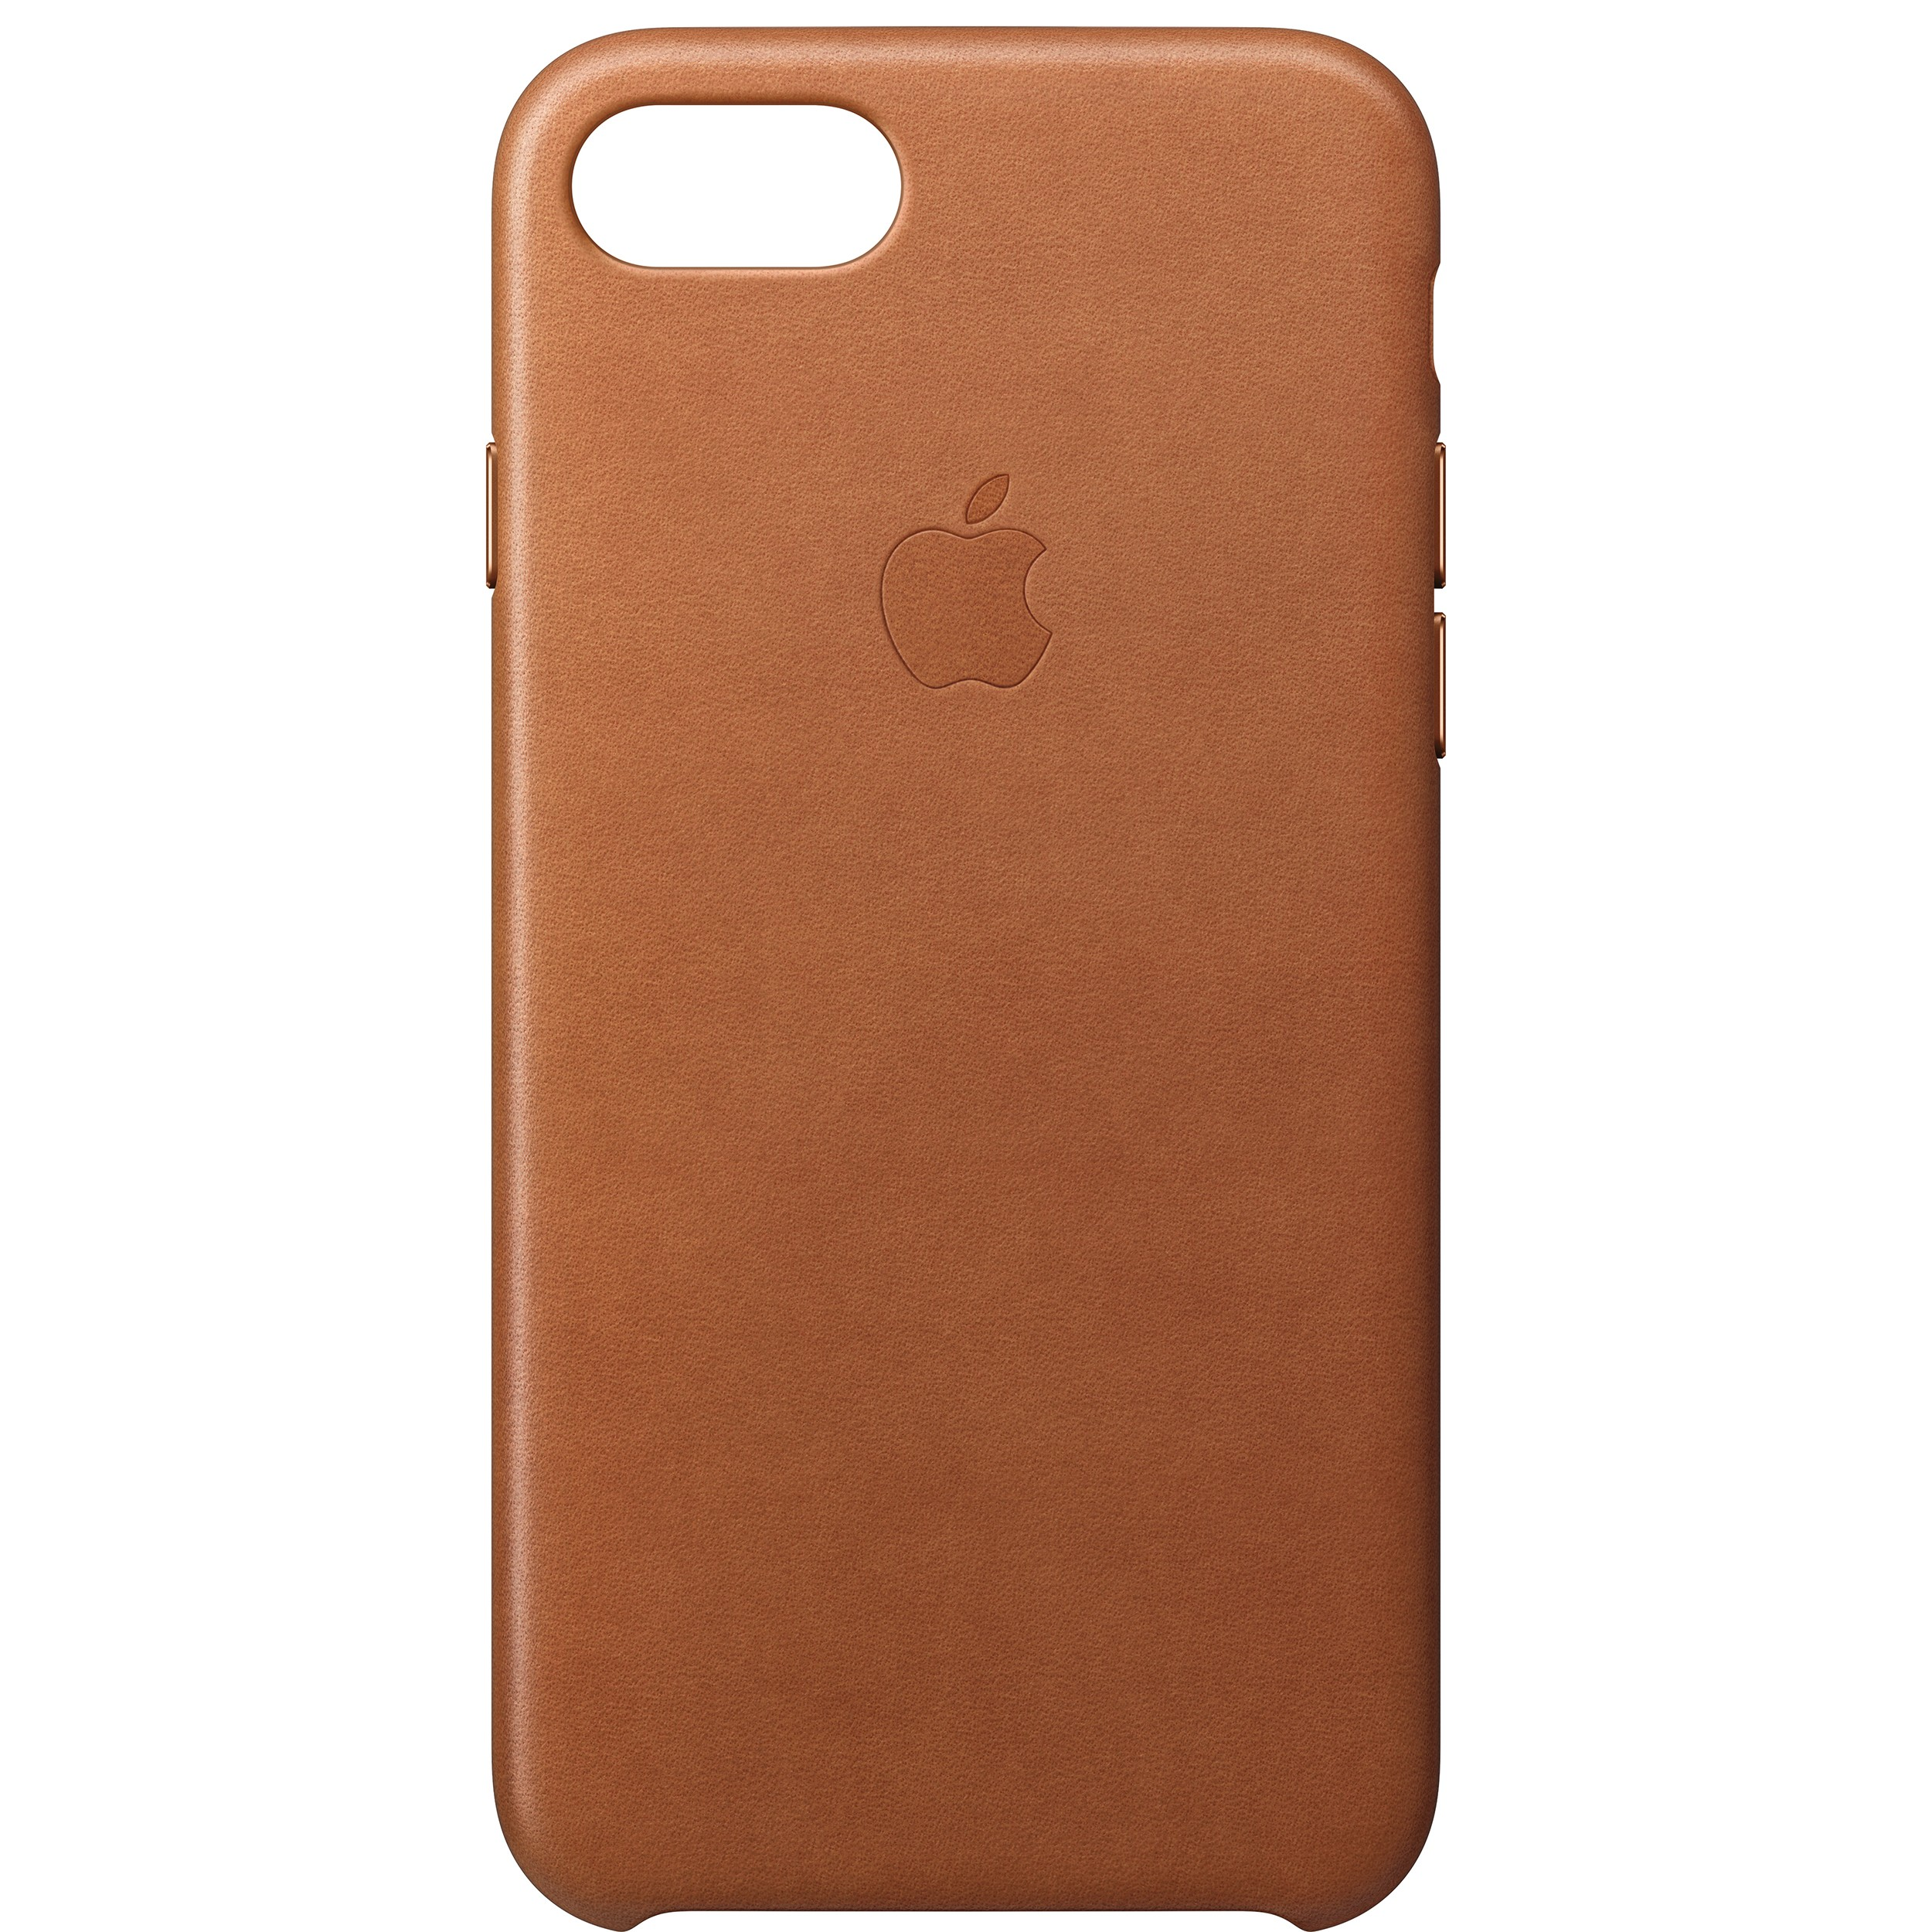 MMY22ZM/A : Apple iPhone 7 skinndeksel (brun)